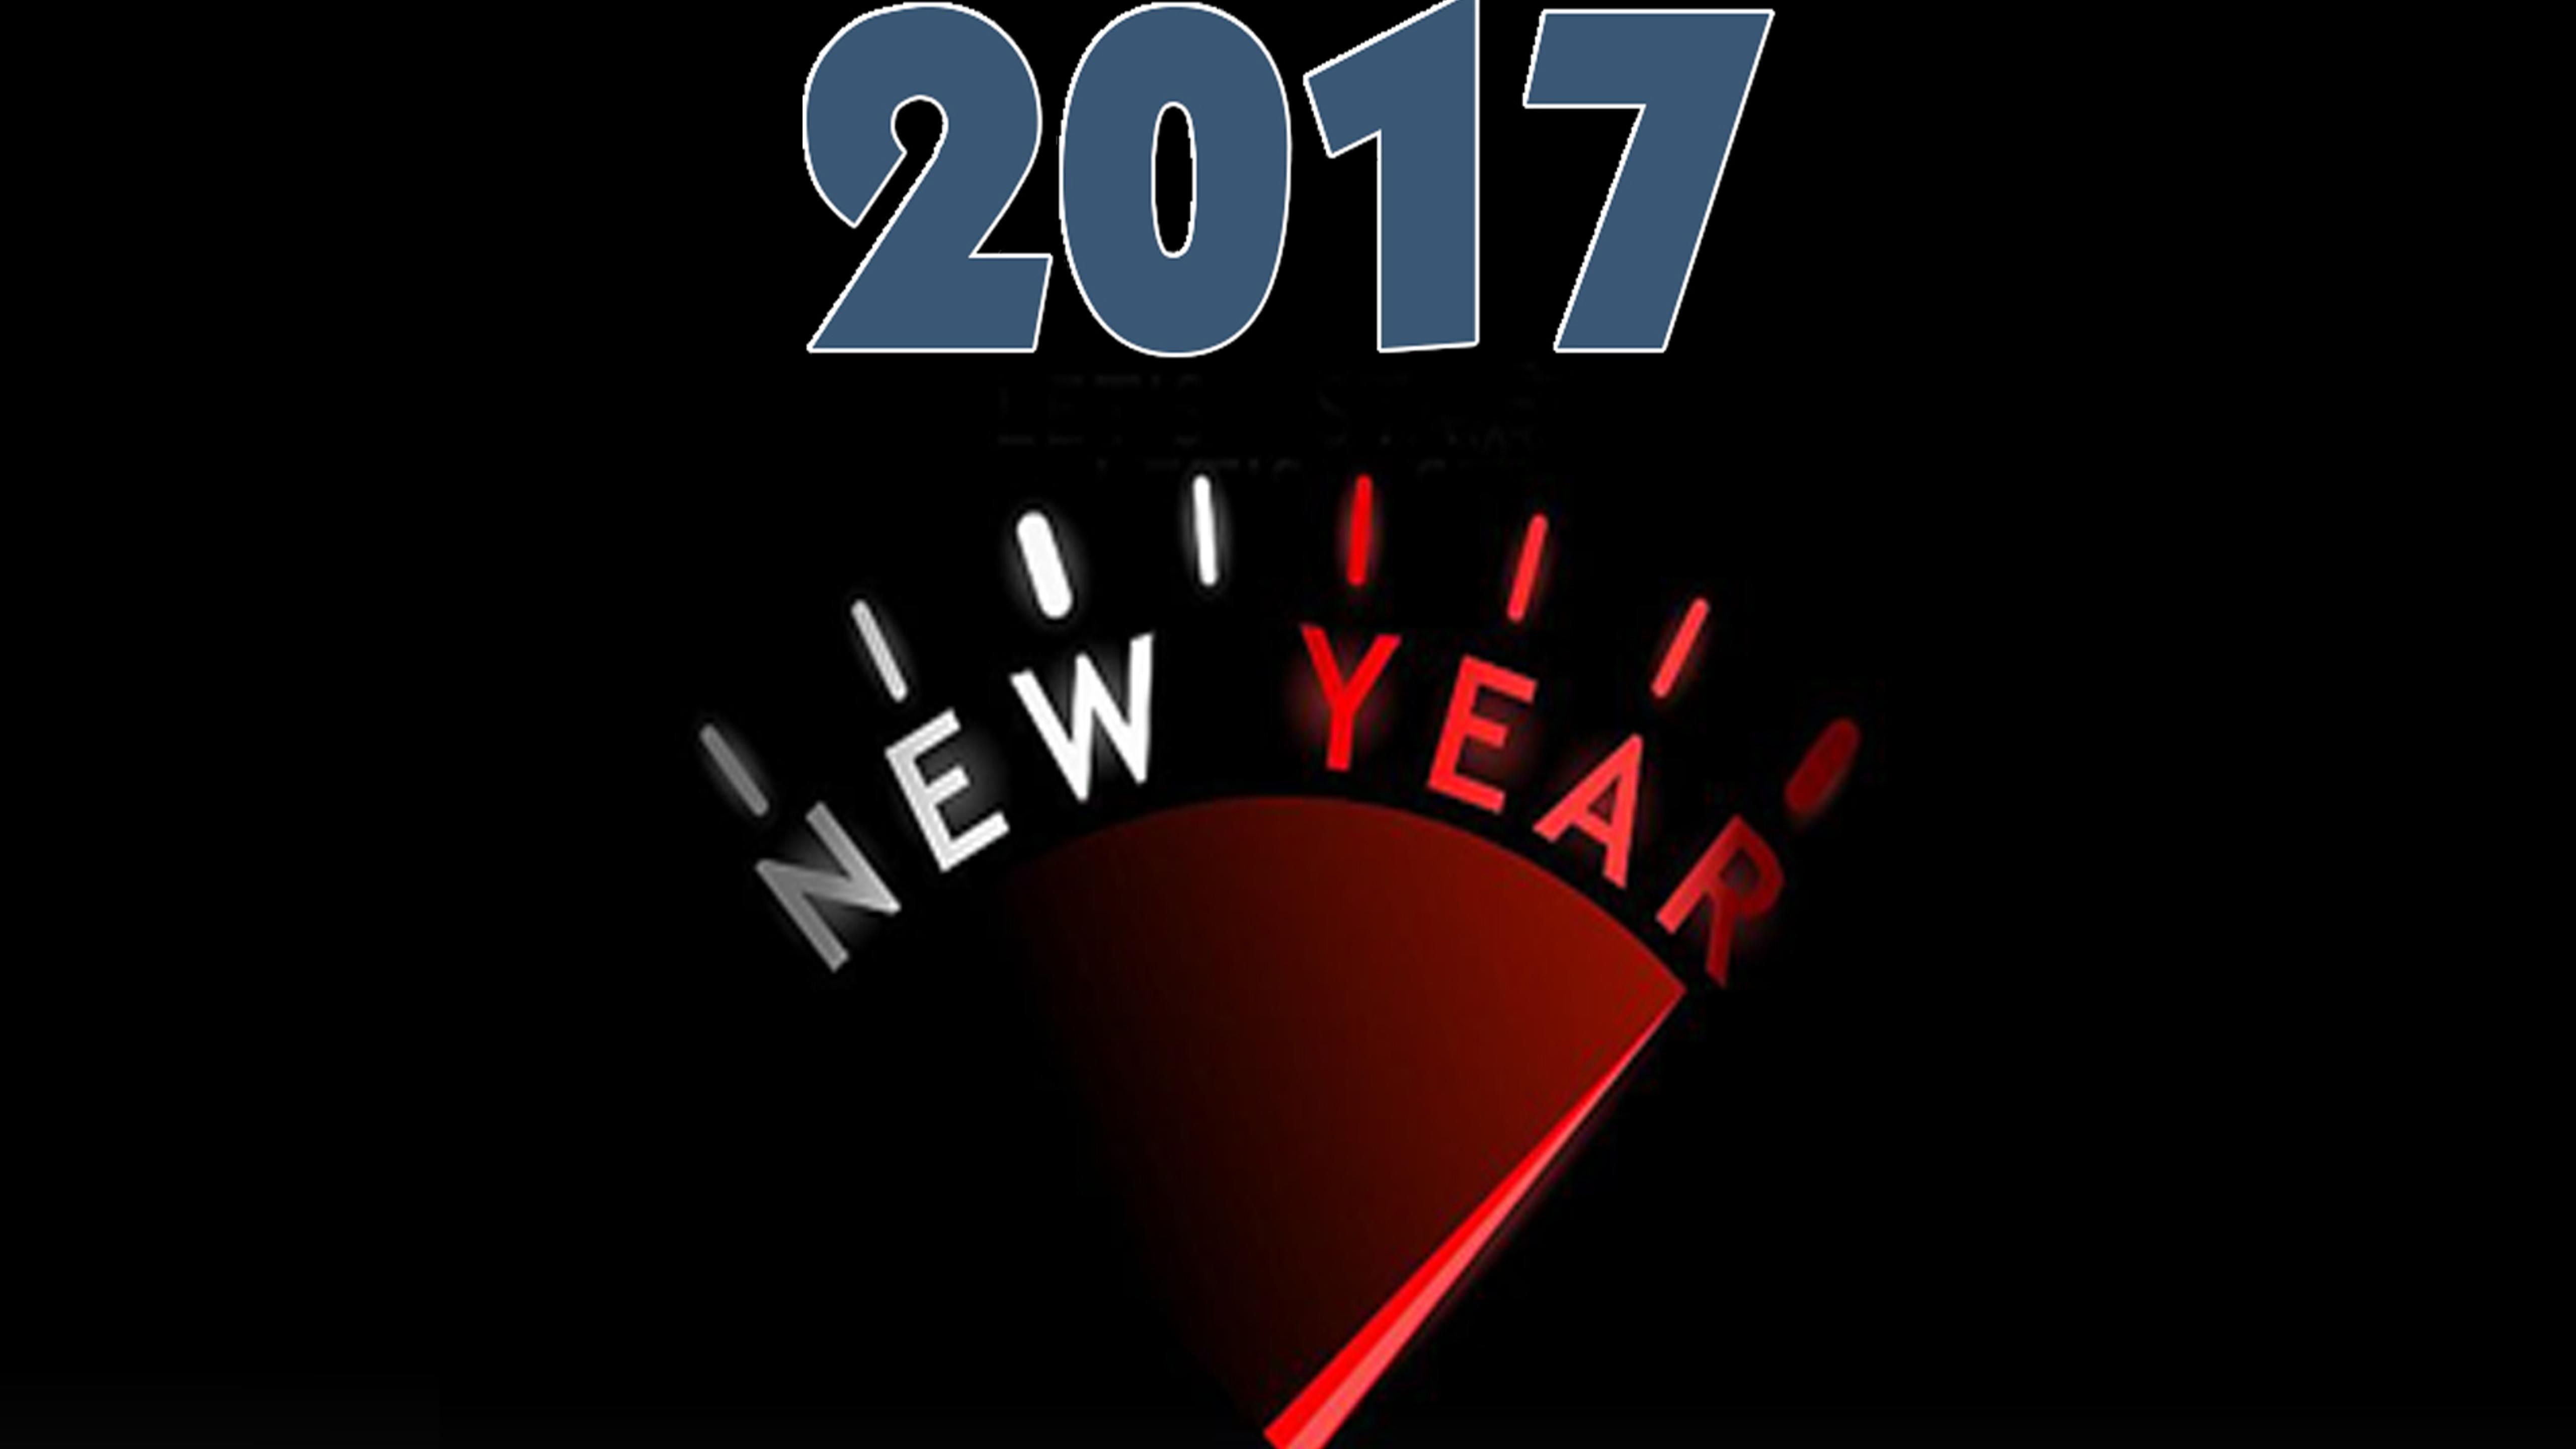 The New Year 2017 Begin Hd Wallpaper